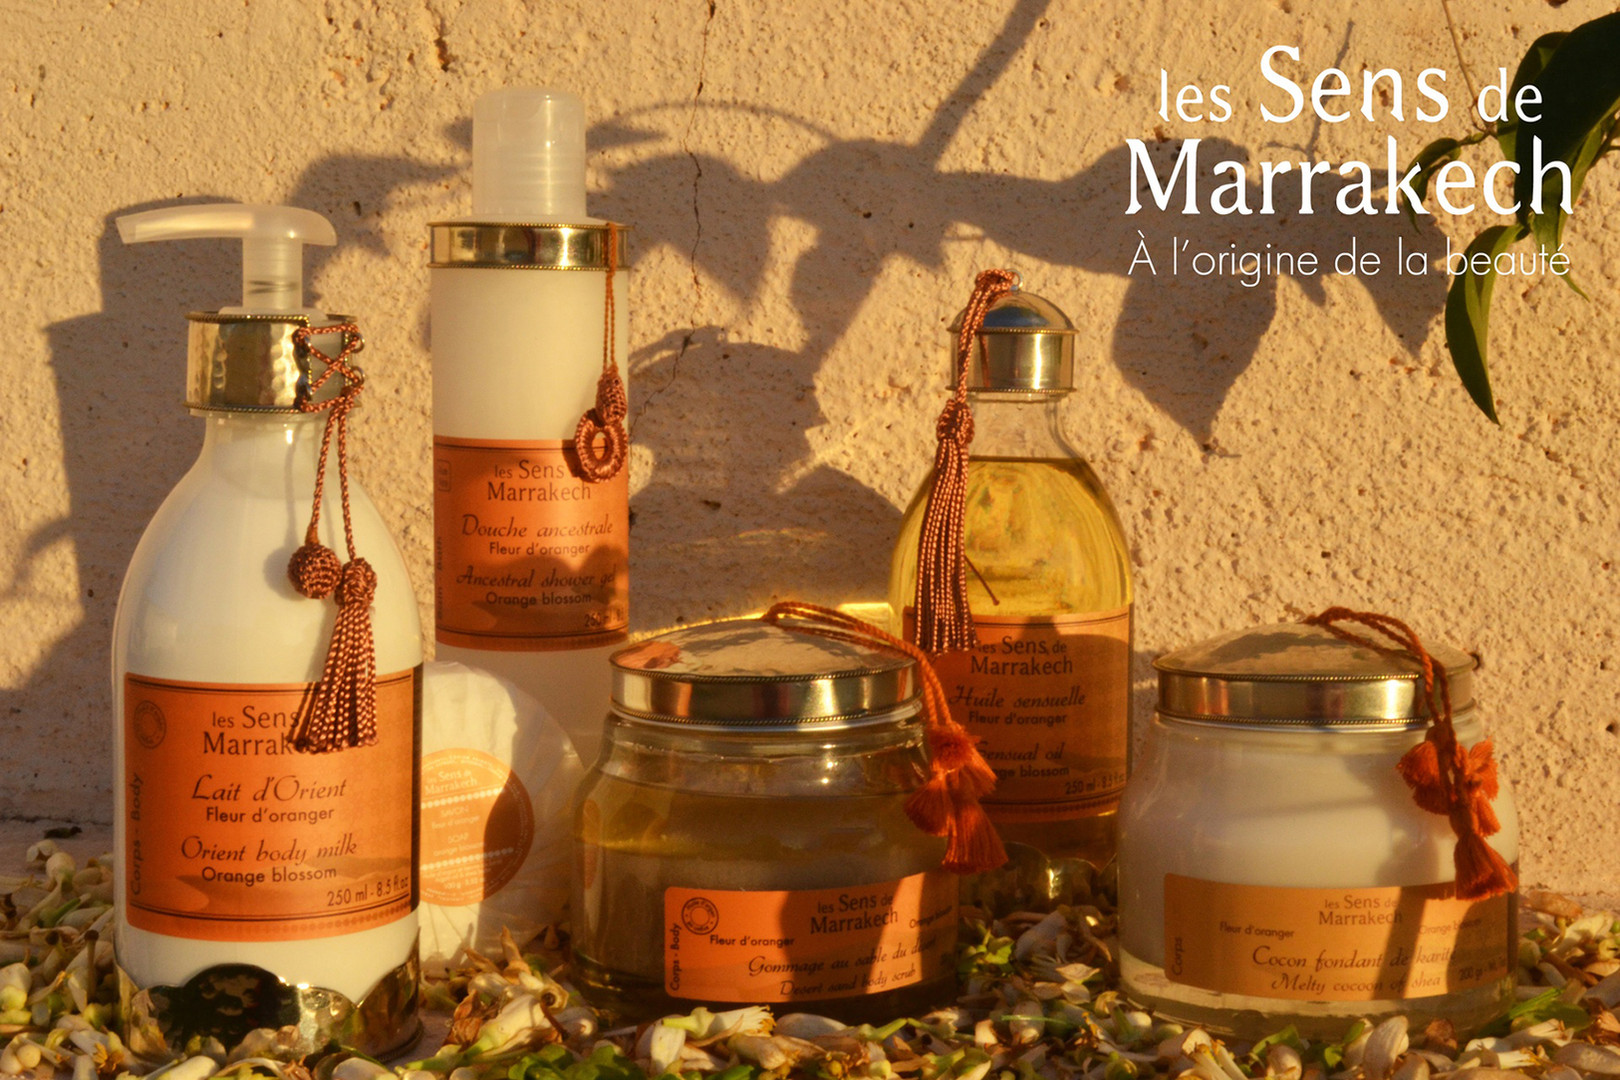 spa-les-sens-de-marrakech-by-riad-moncea